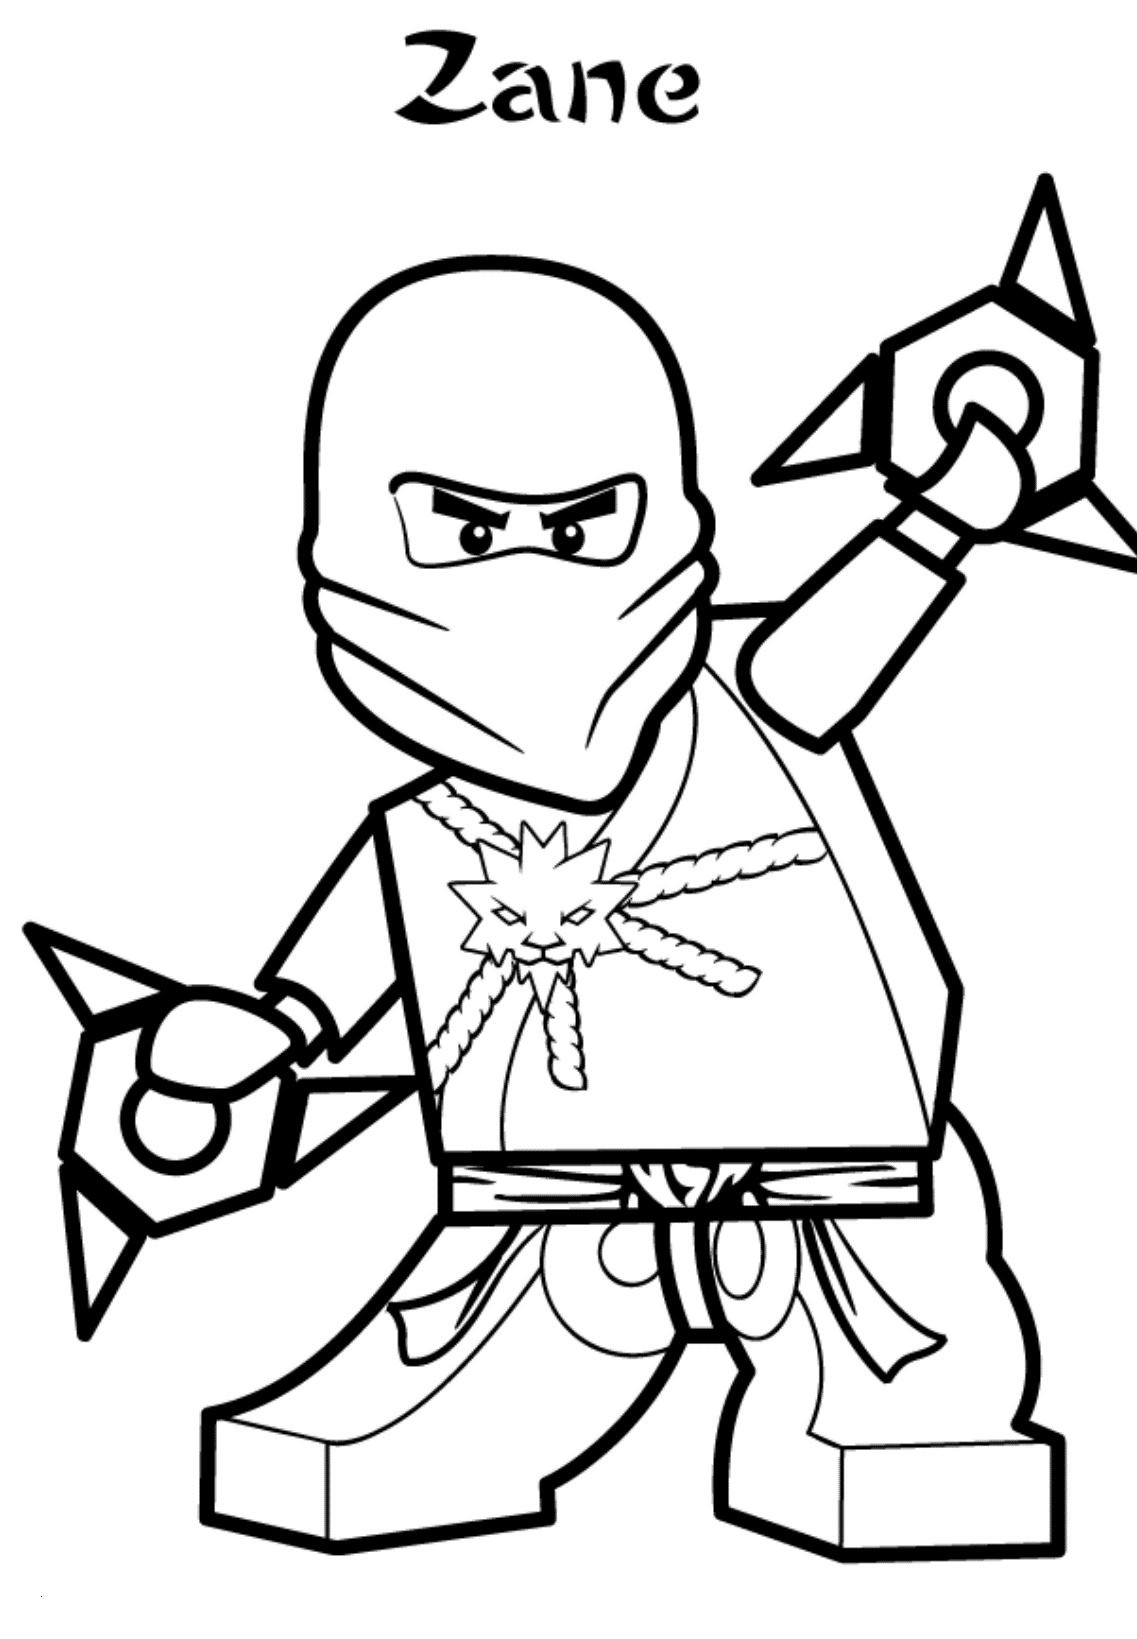 Ninjago Waffen Ausmalbilder Inspirierend 40 Ninjago Ausmalbilder Nya forstergallery Stock